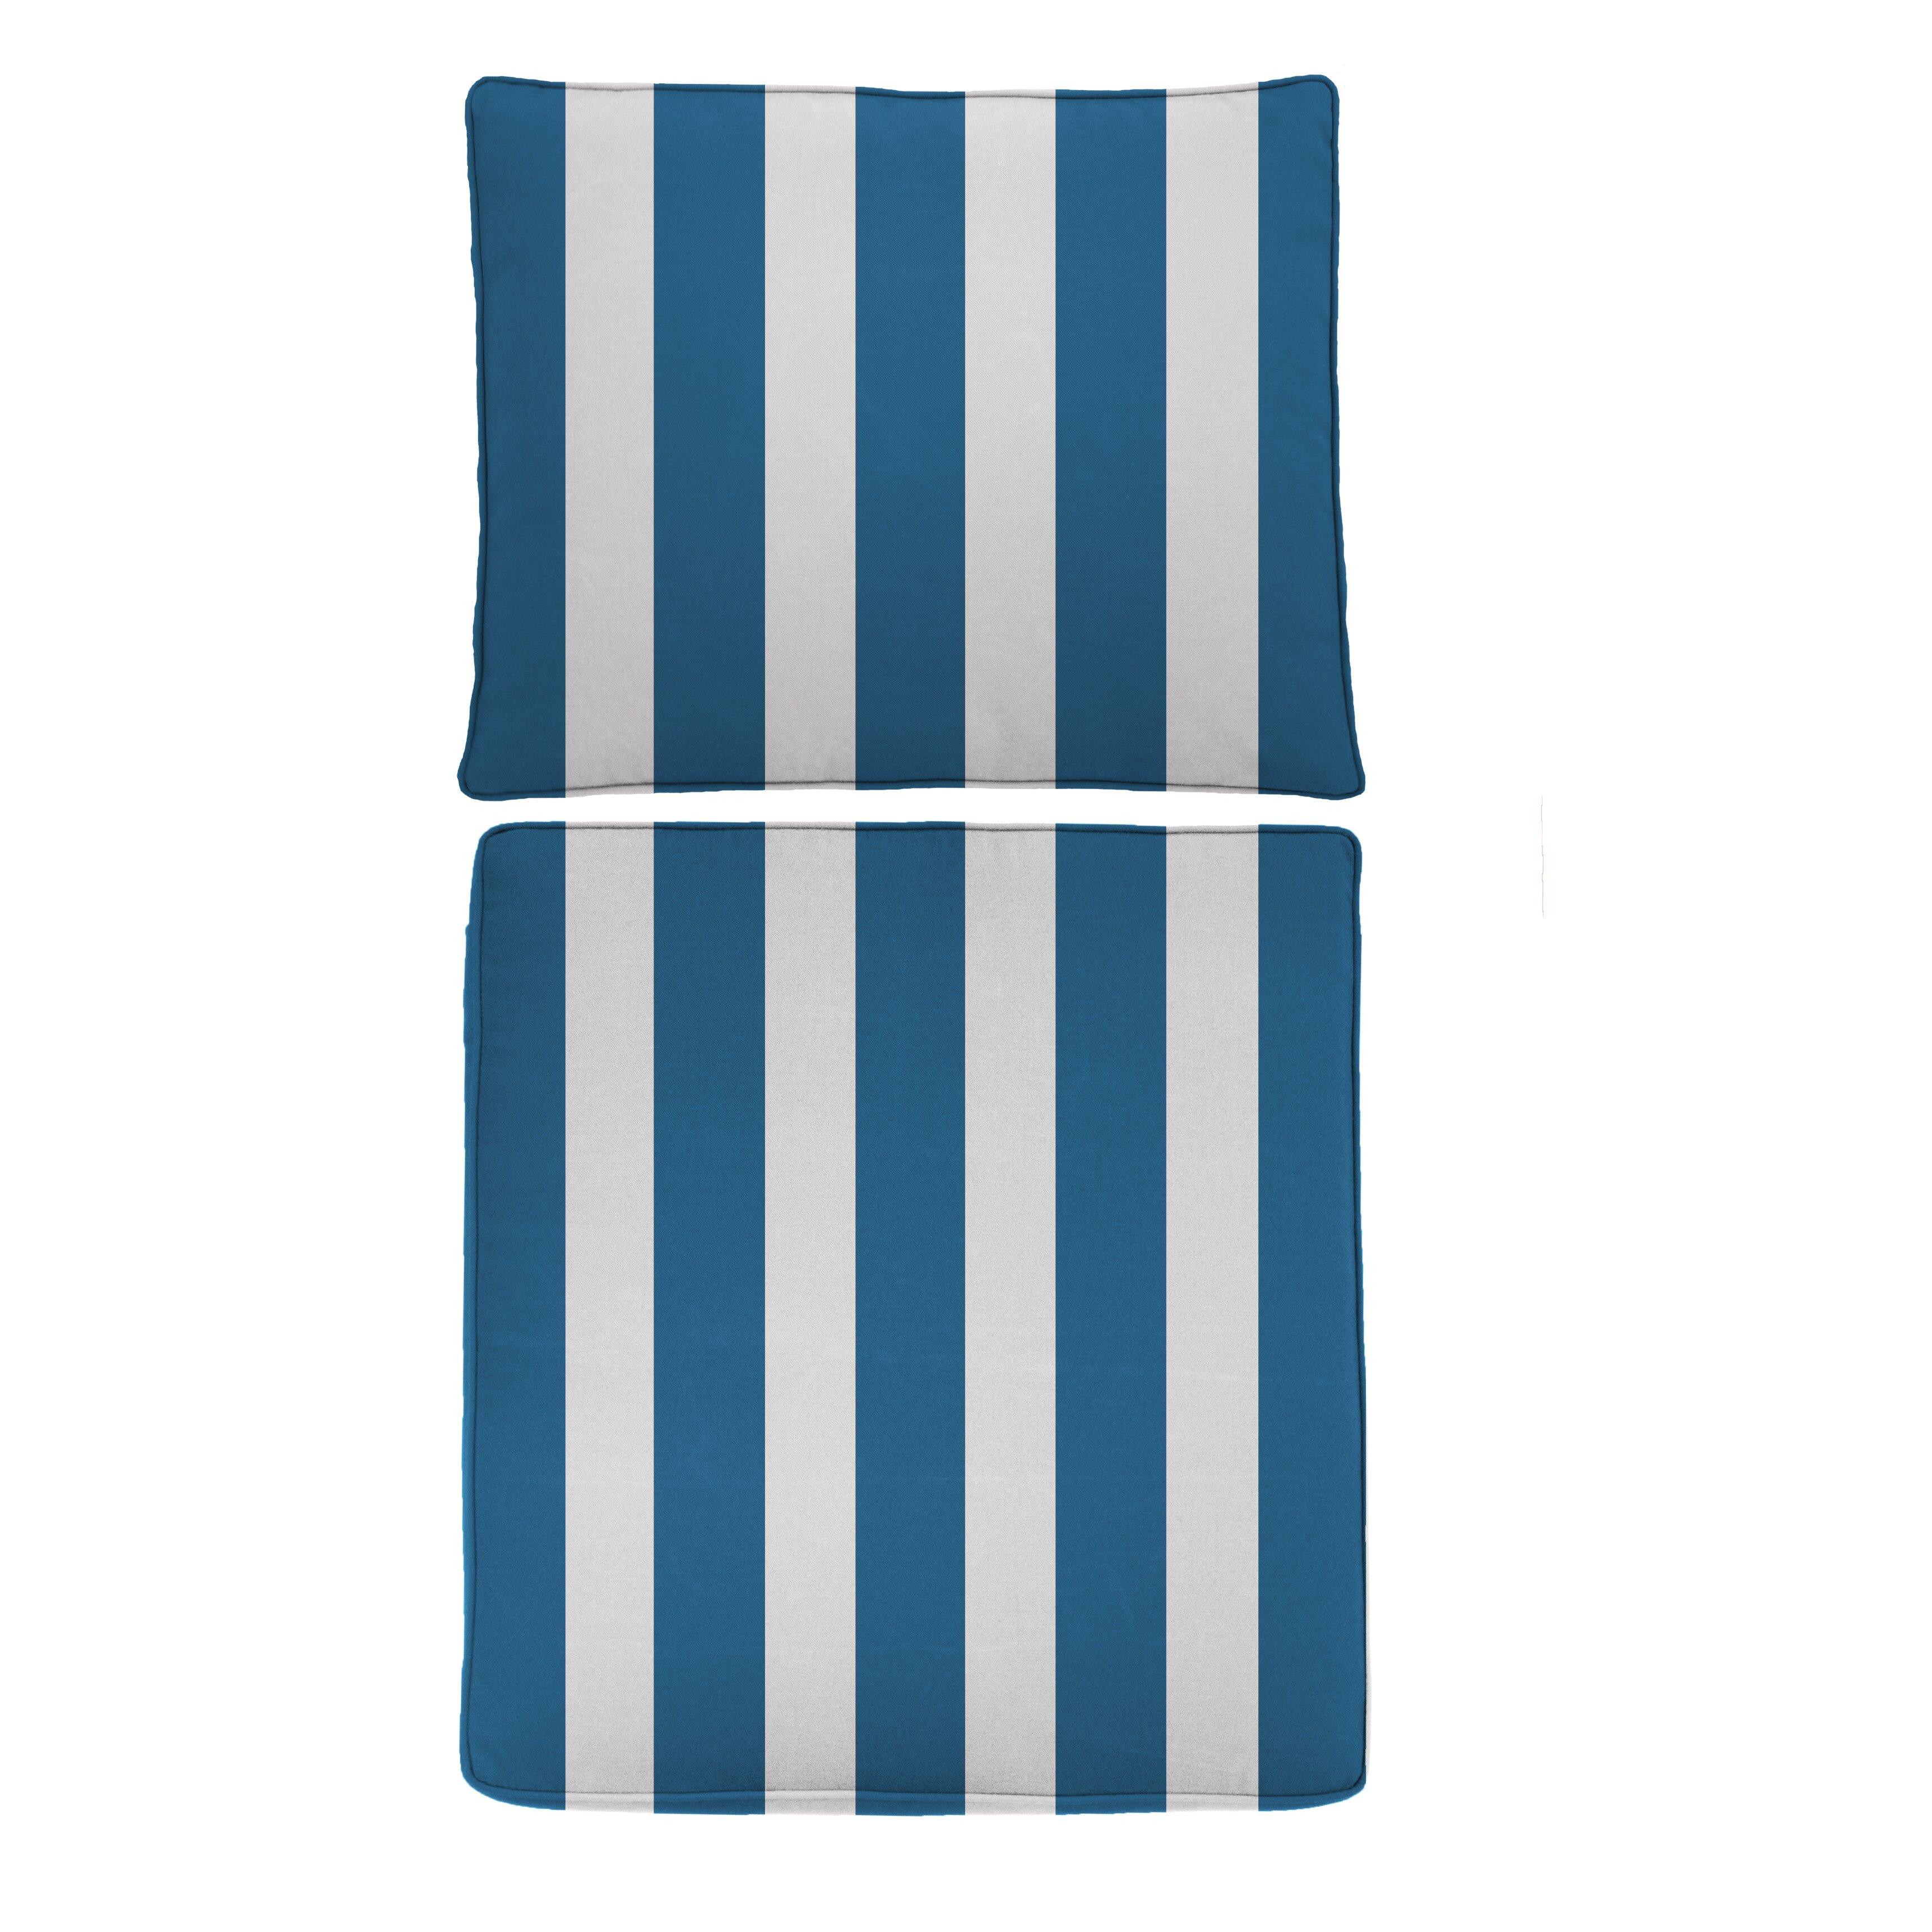 wayfair custom outdoor cushions outdoor sunbrella double piped deep